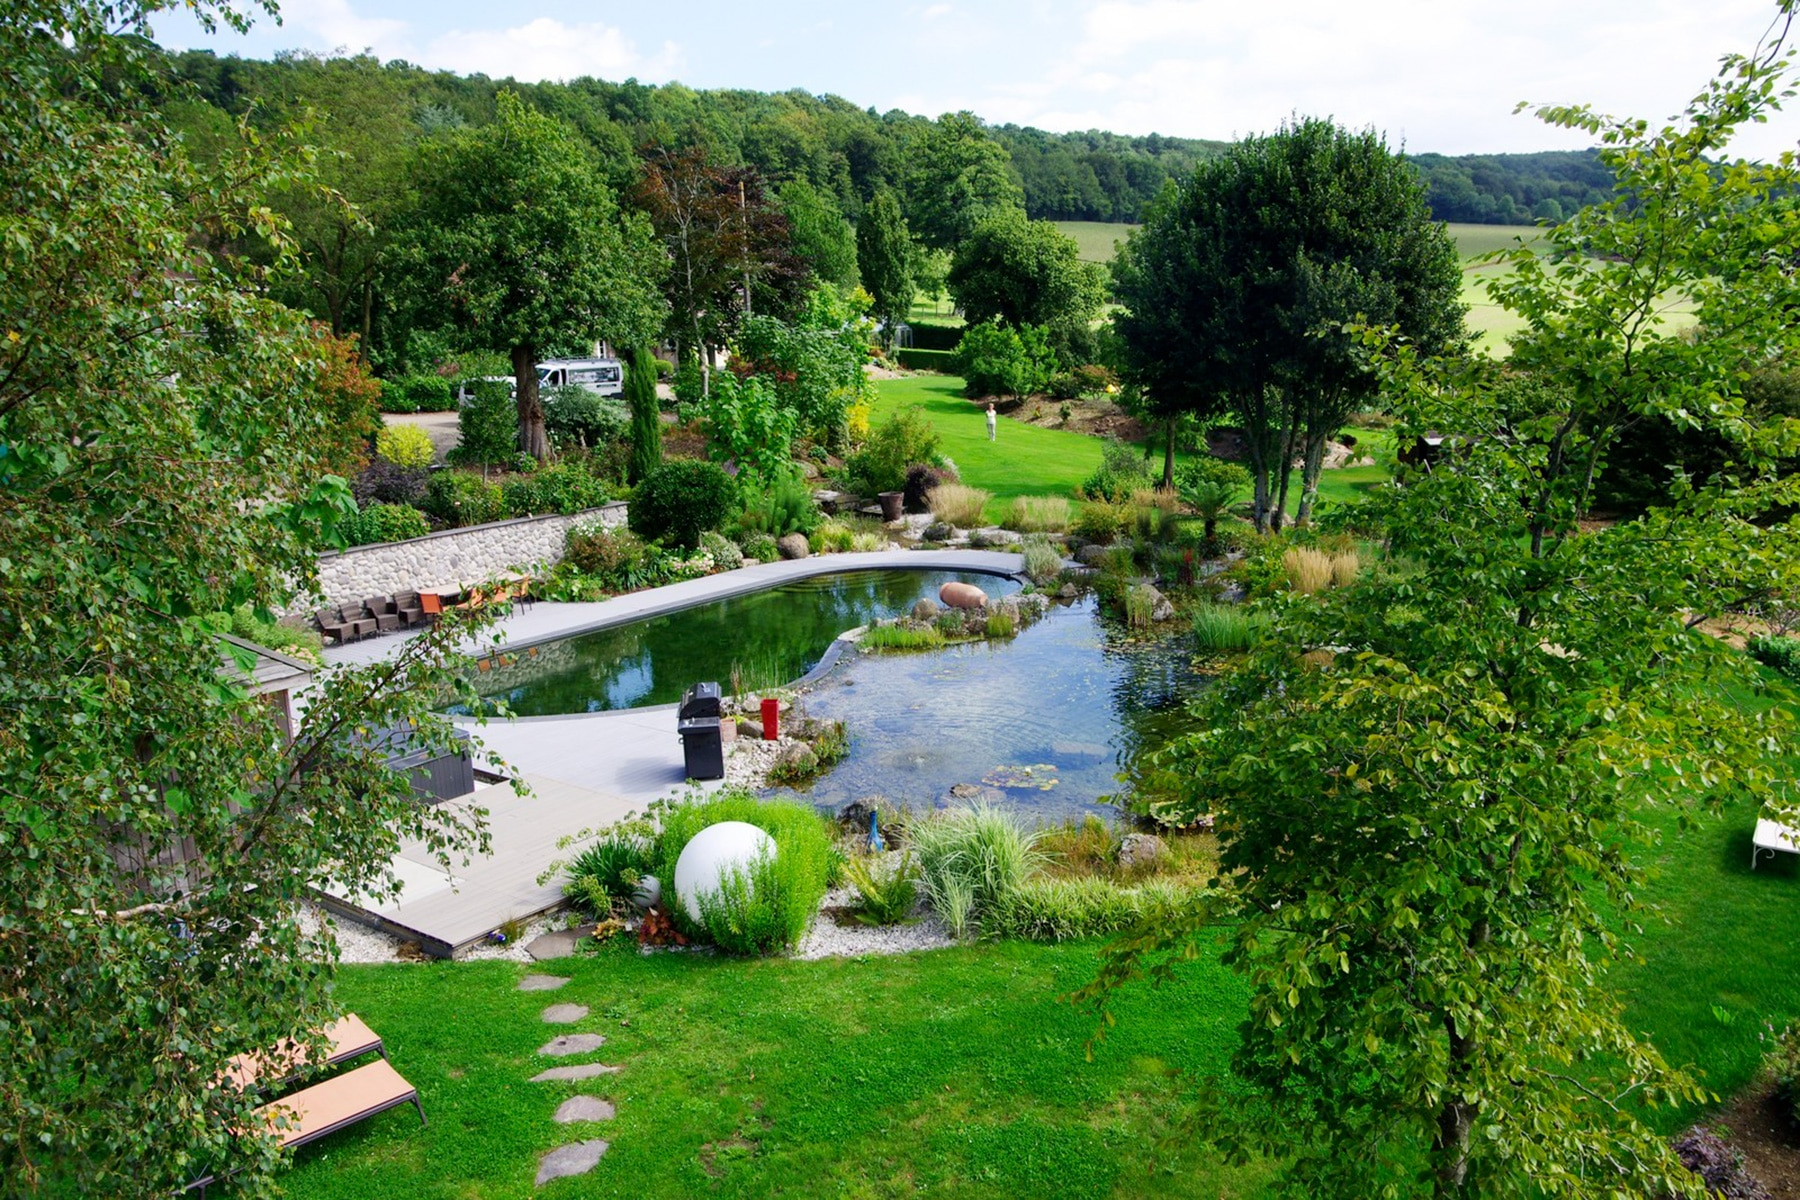 Piscine Naturelle - Bassin De Baignade Naturel | Paysages ... encequiconcerne Piscine Naturelle En Kit